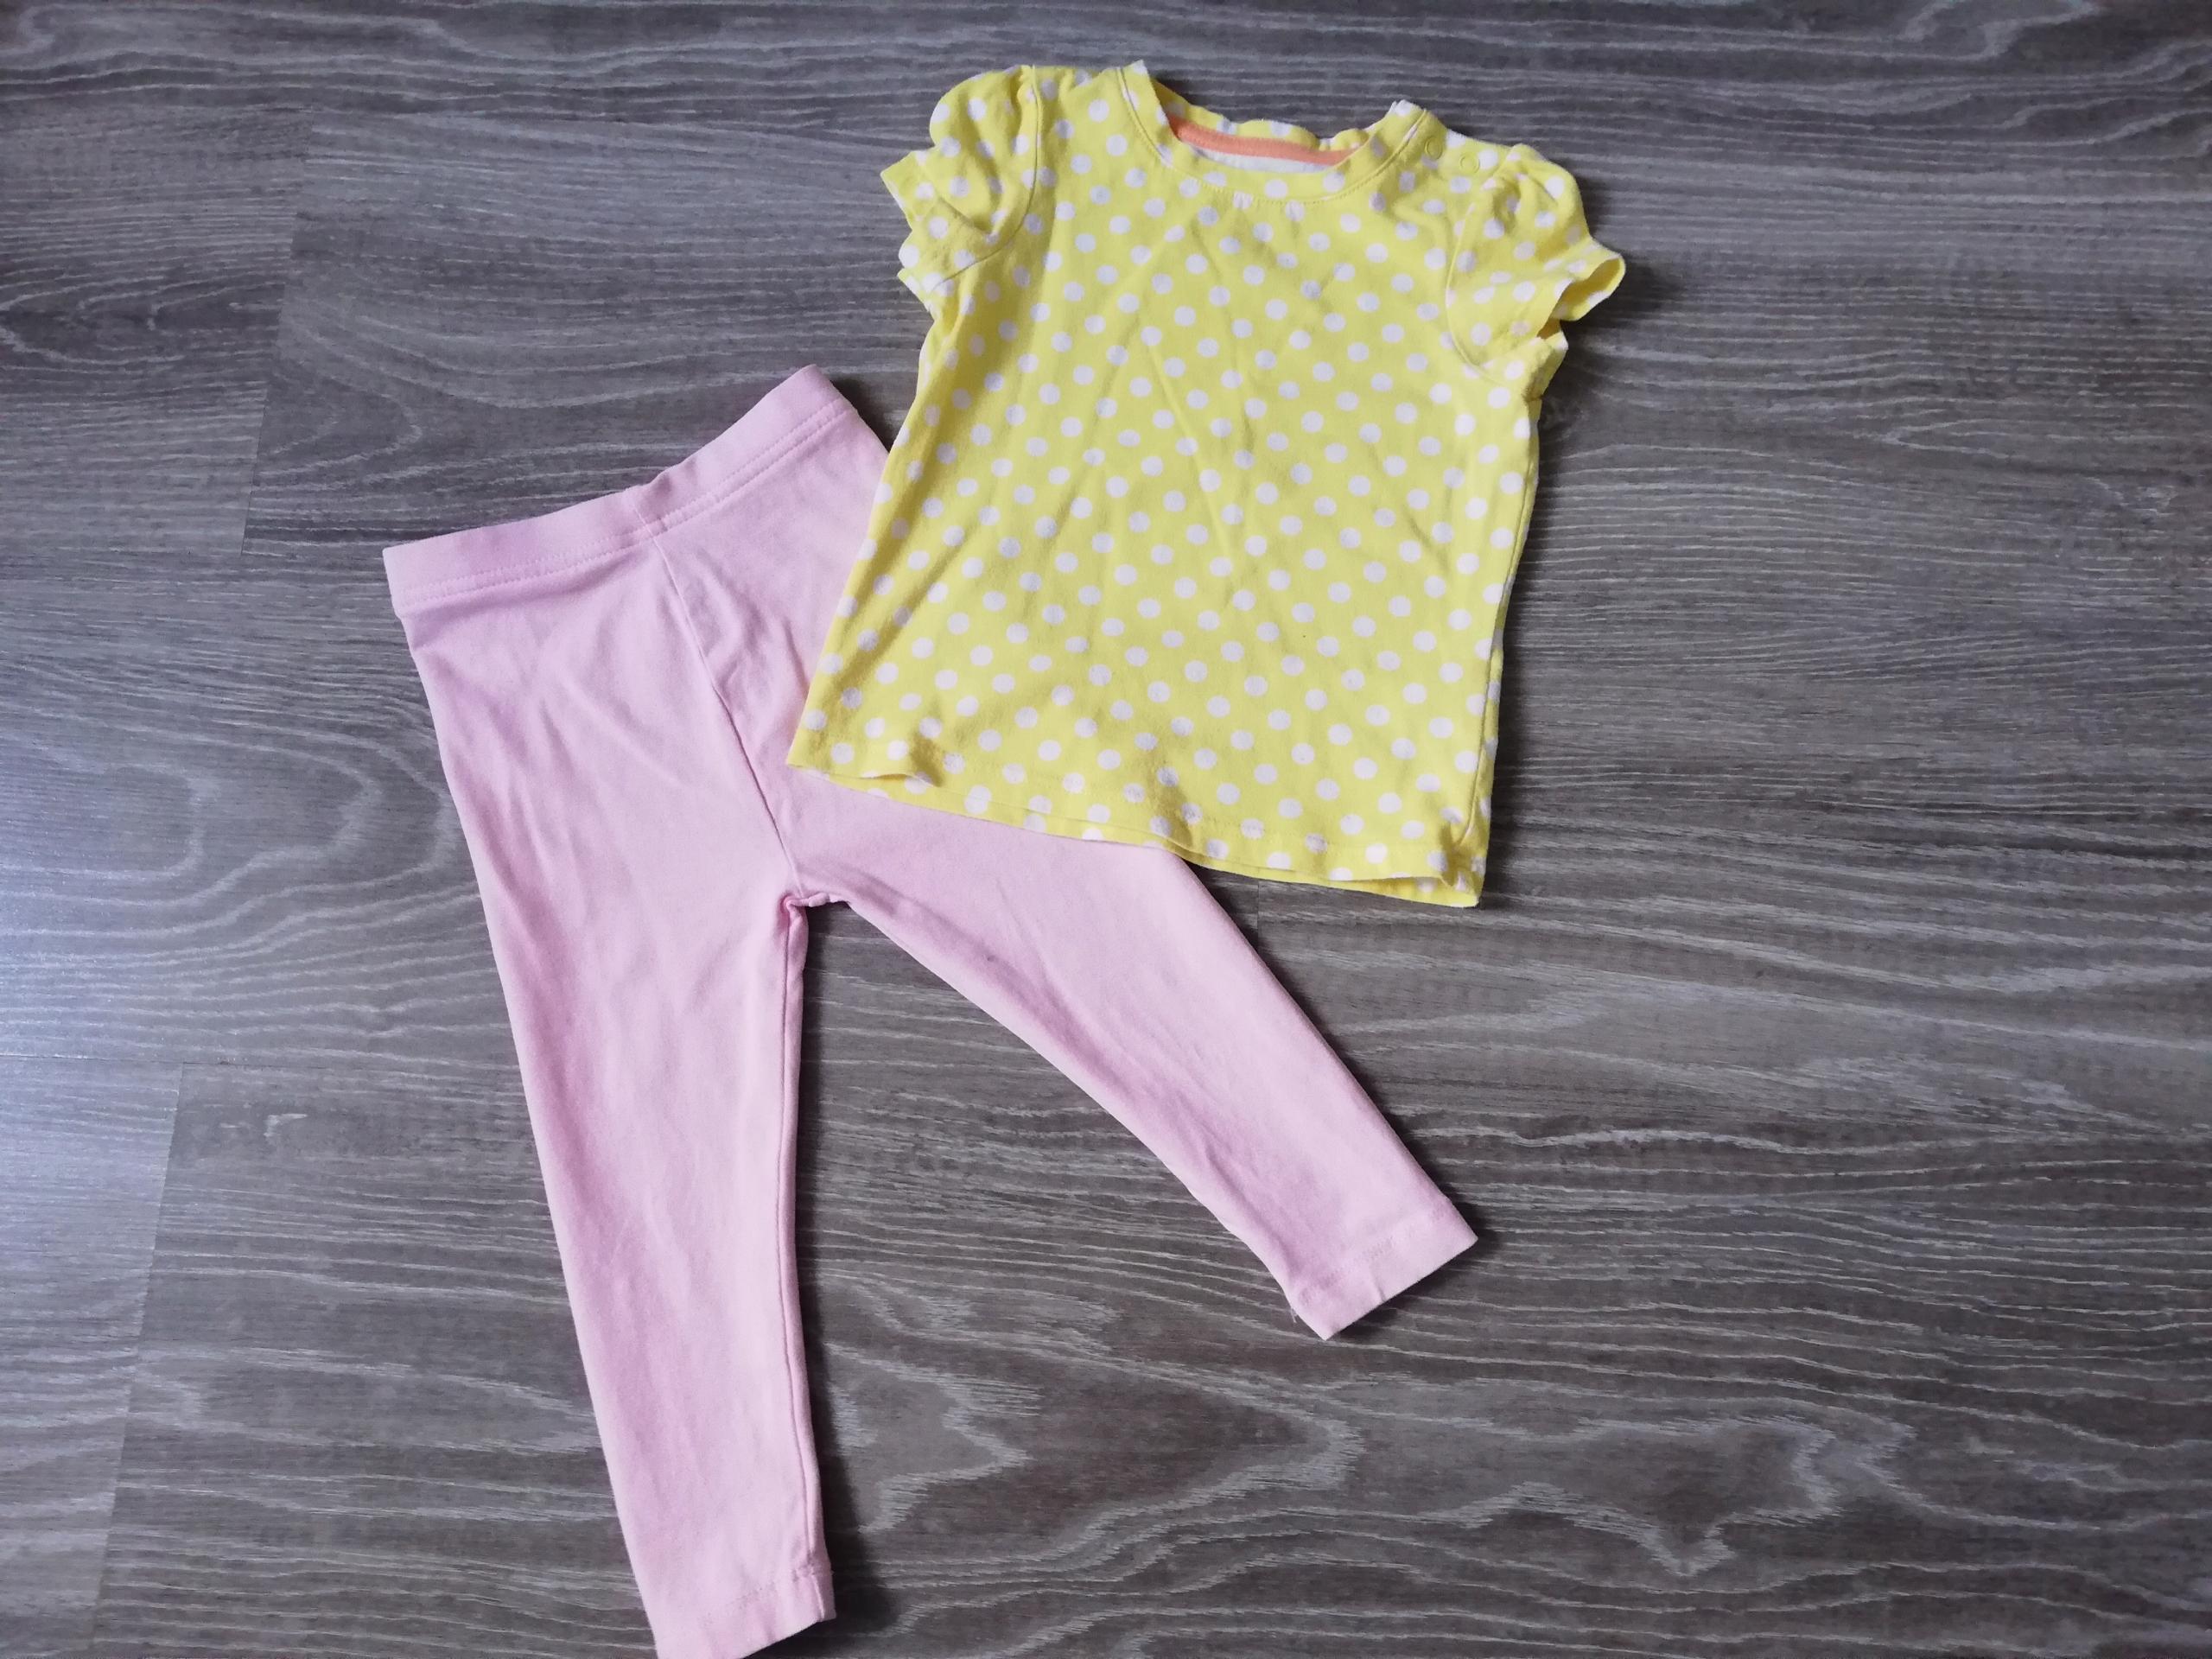 Zestaw legginsy i koszulka roz 80-86 George